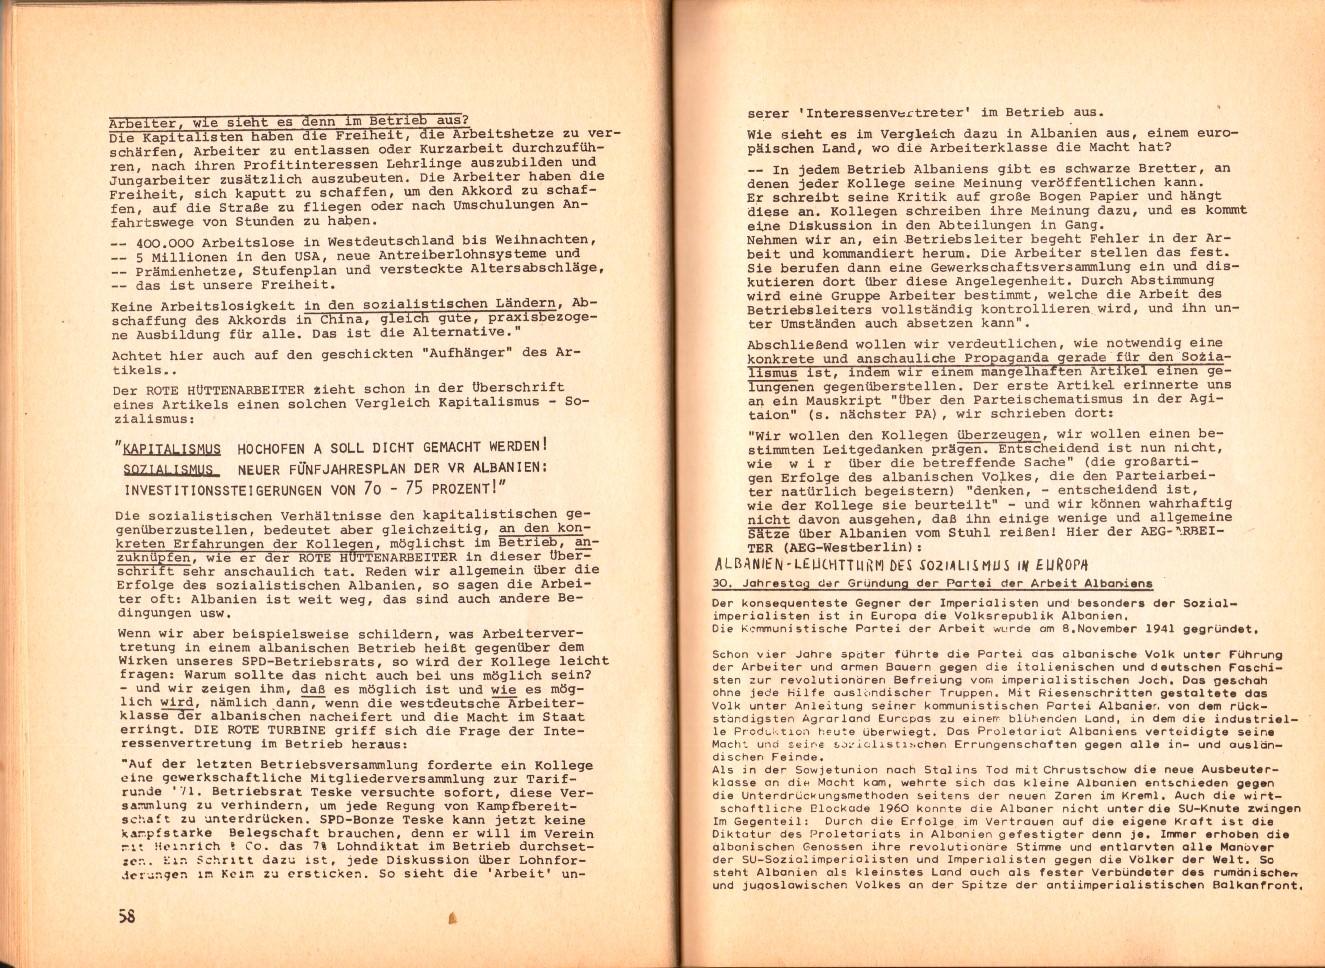 ZB_Parteiarbeiter_1971_10_31